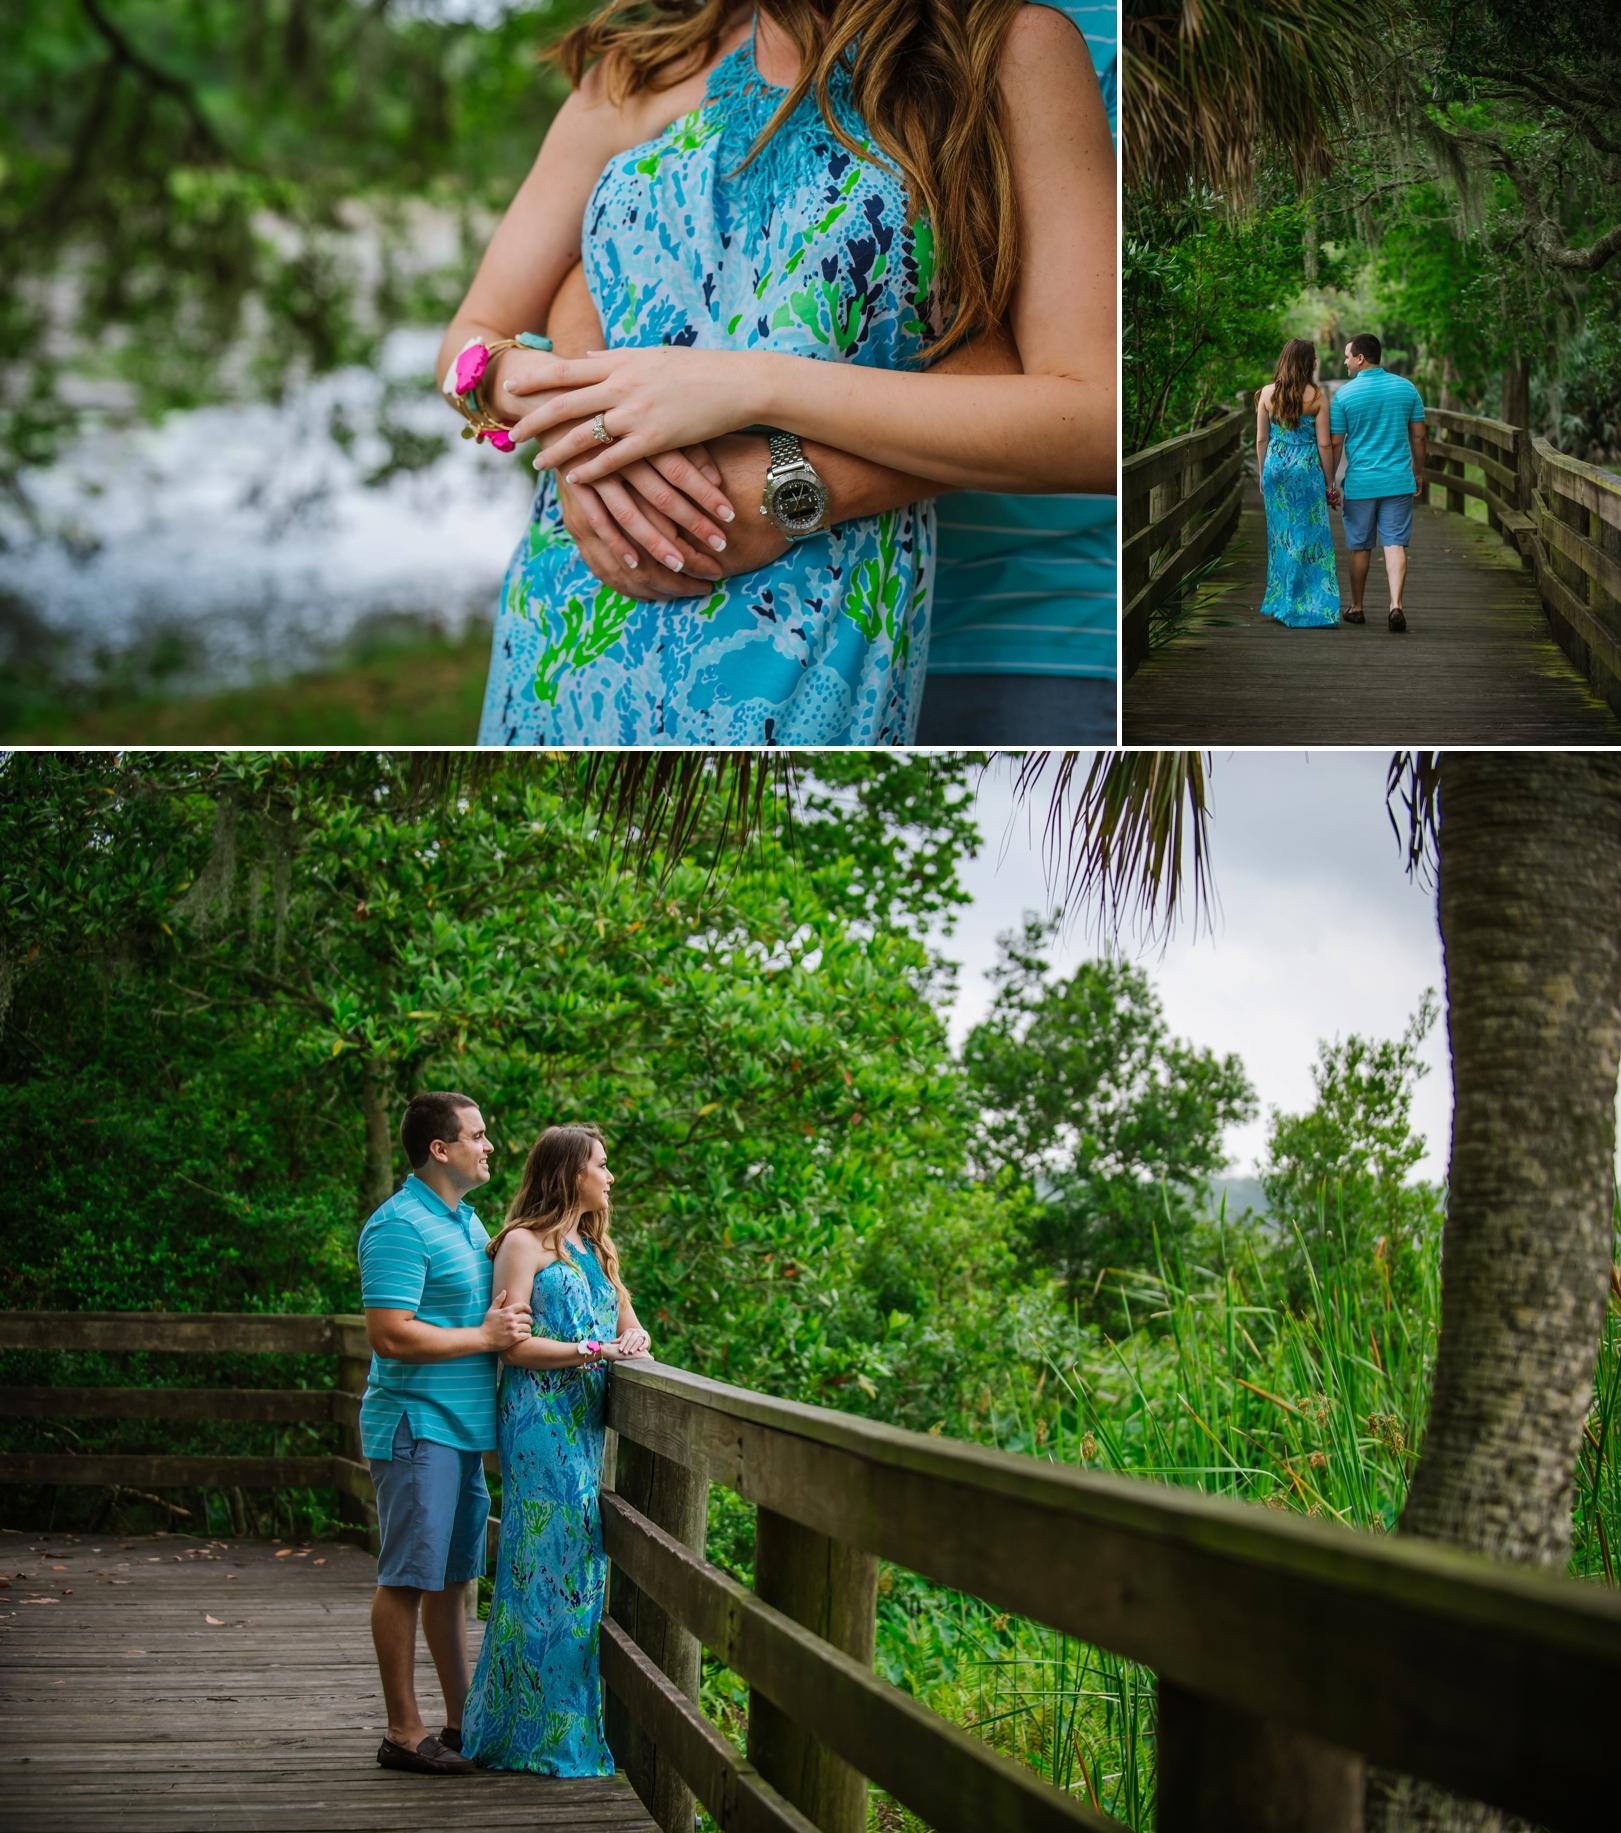 ashlee-hamon-photography-tampa-springs-outdoor-engagement_0005.jpg